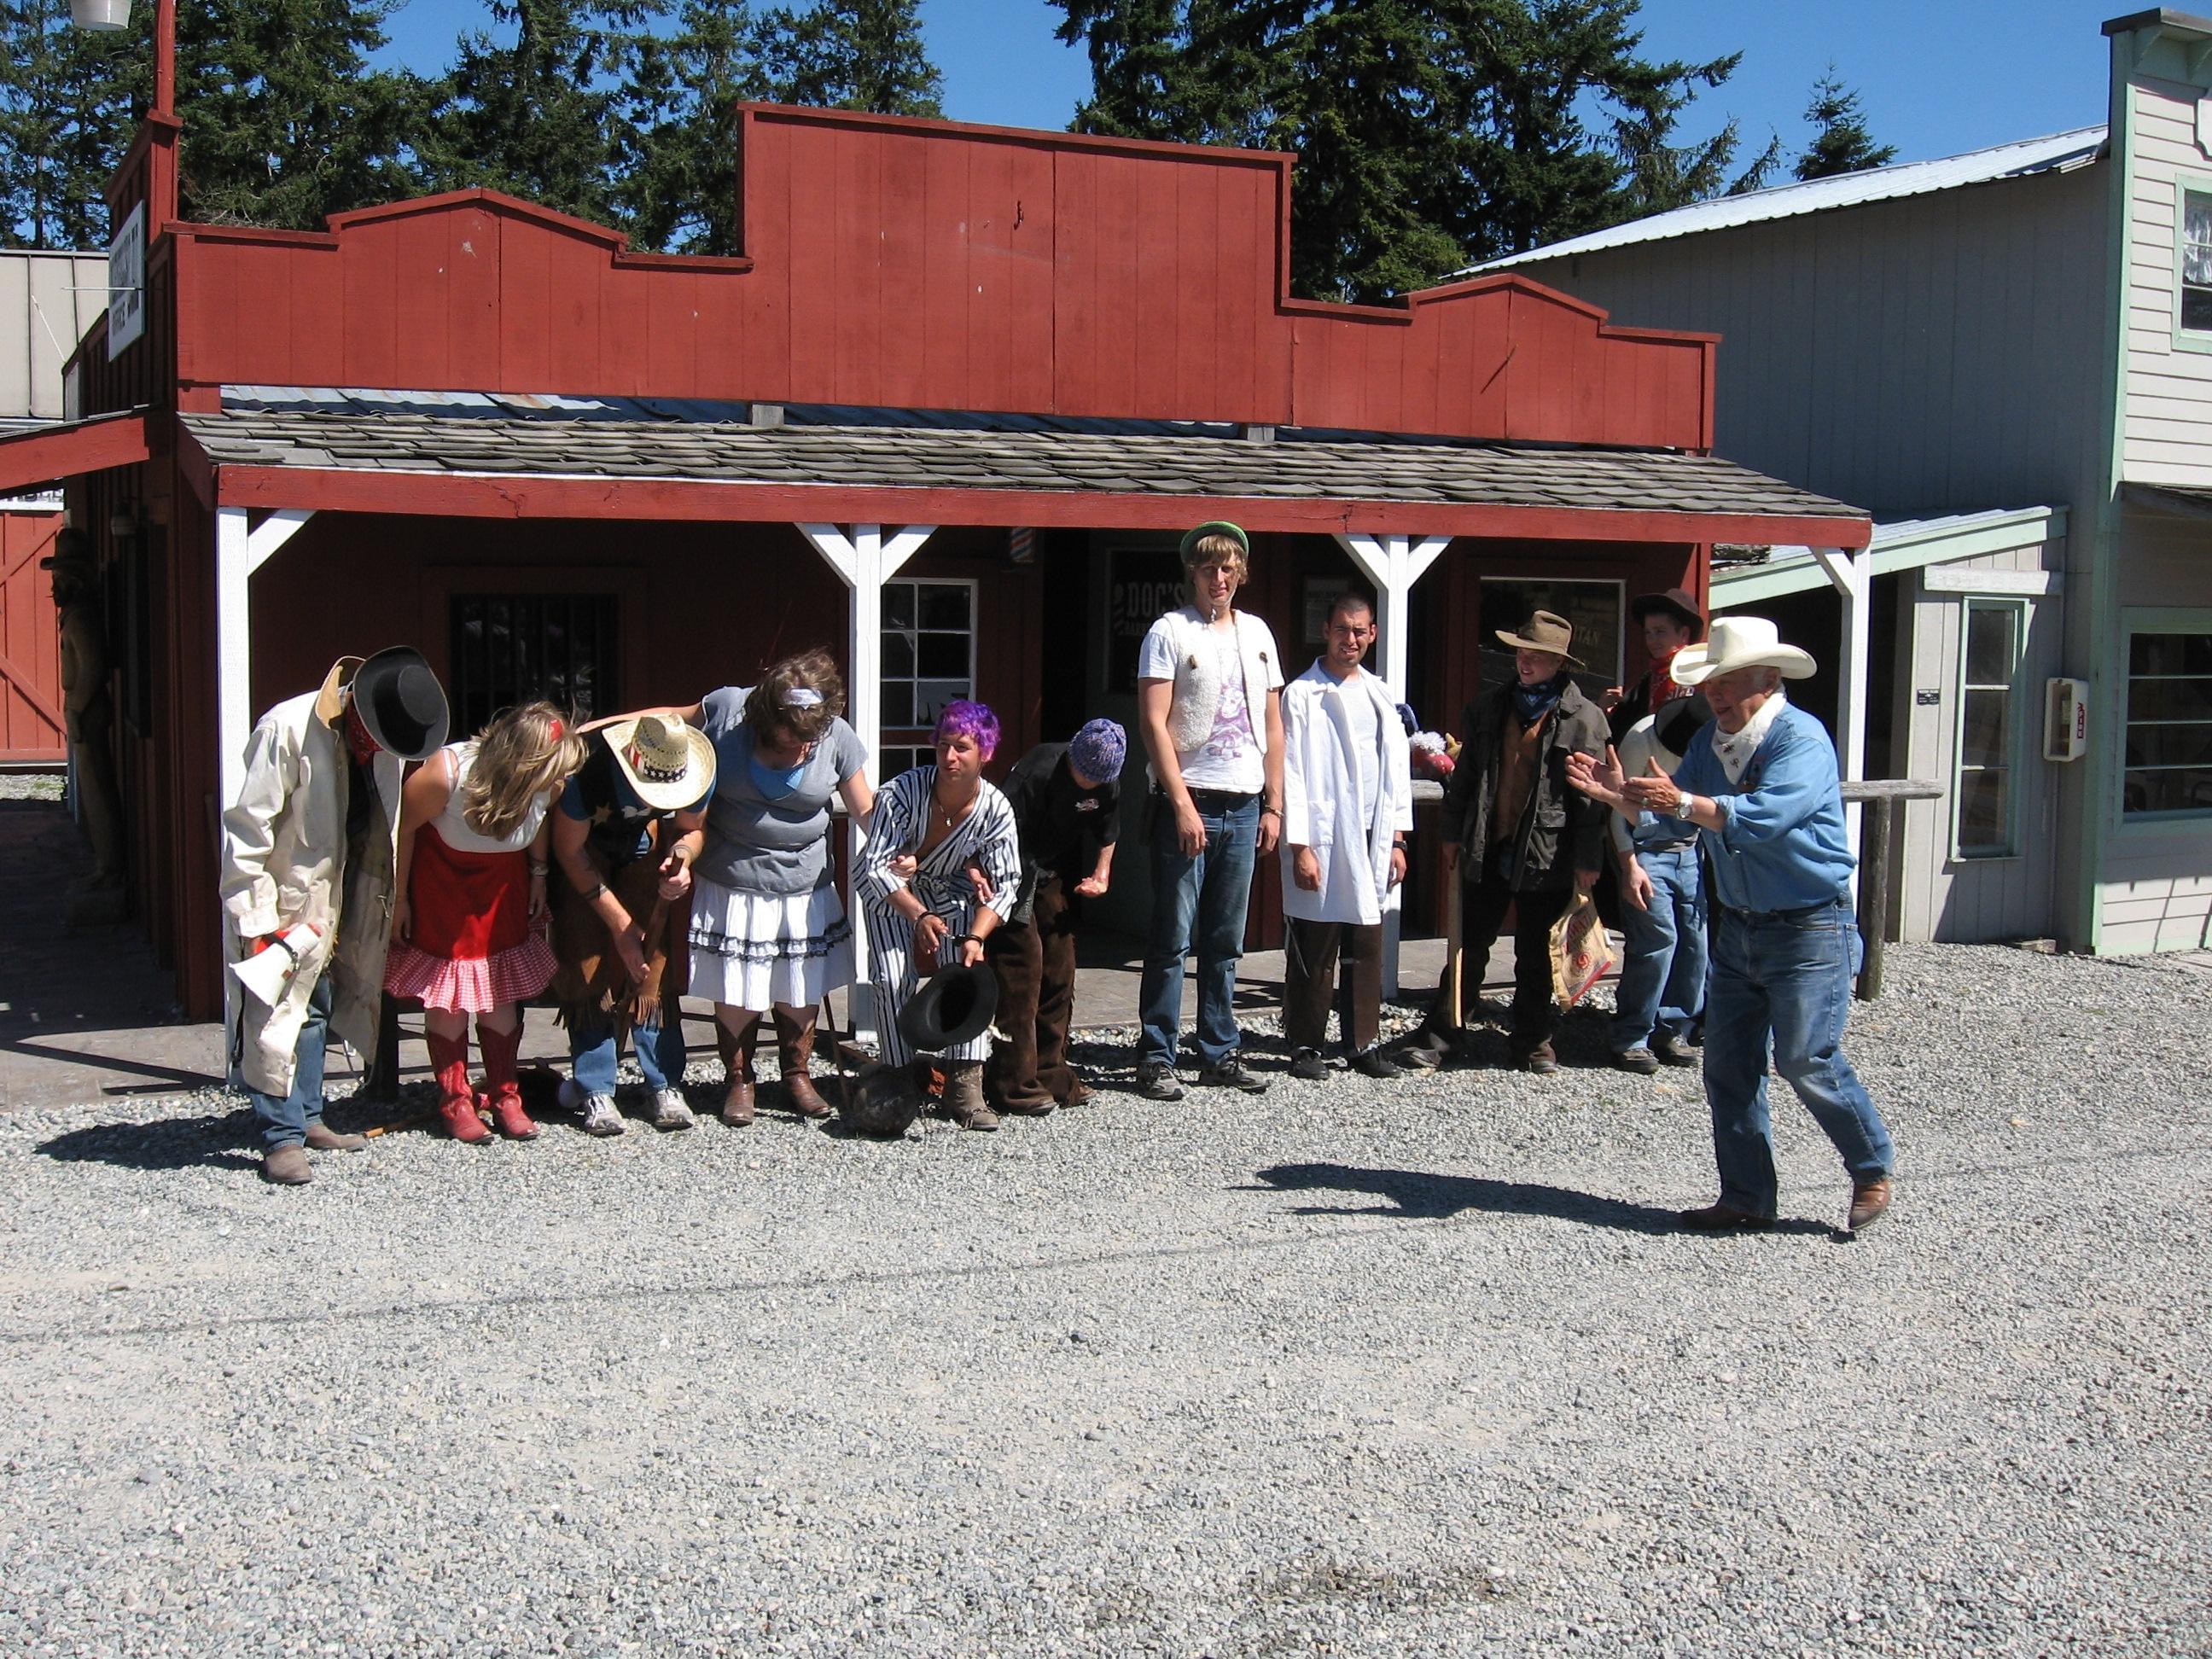 Cowboy Town skit